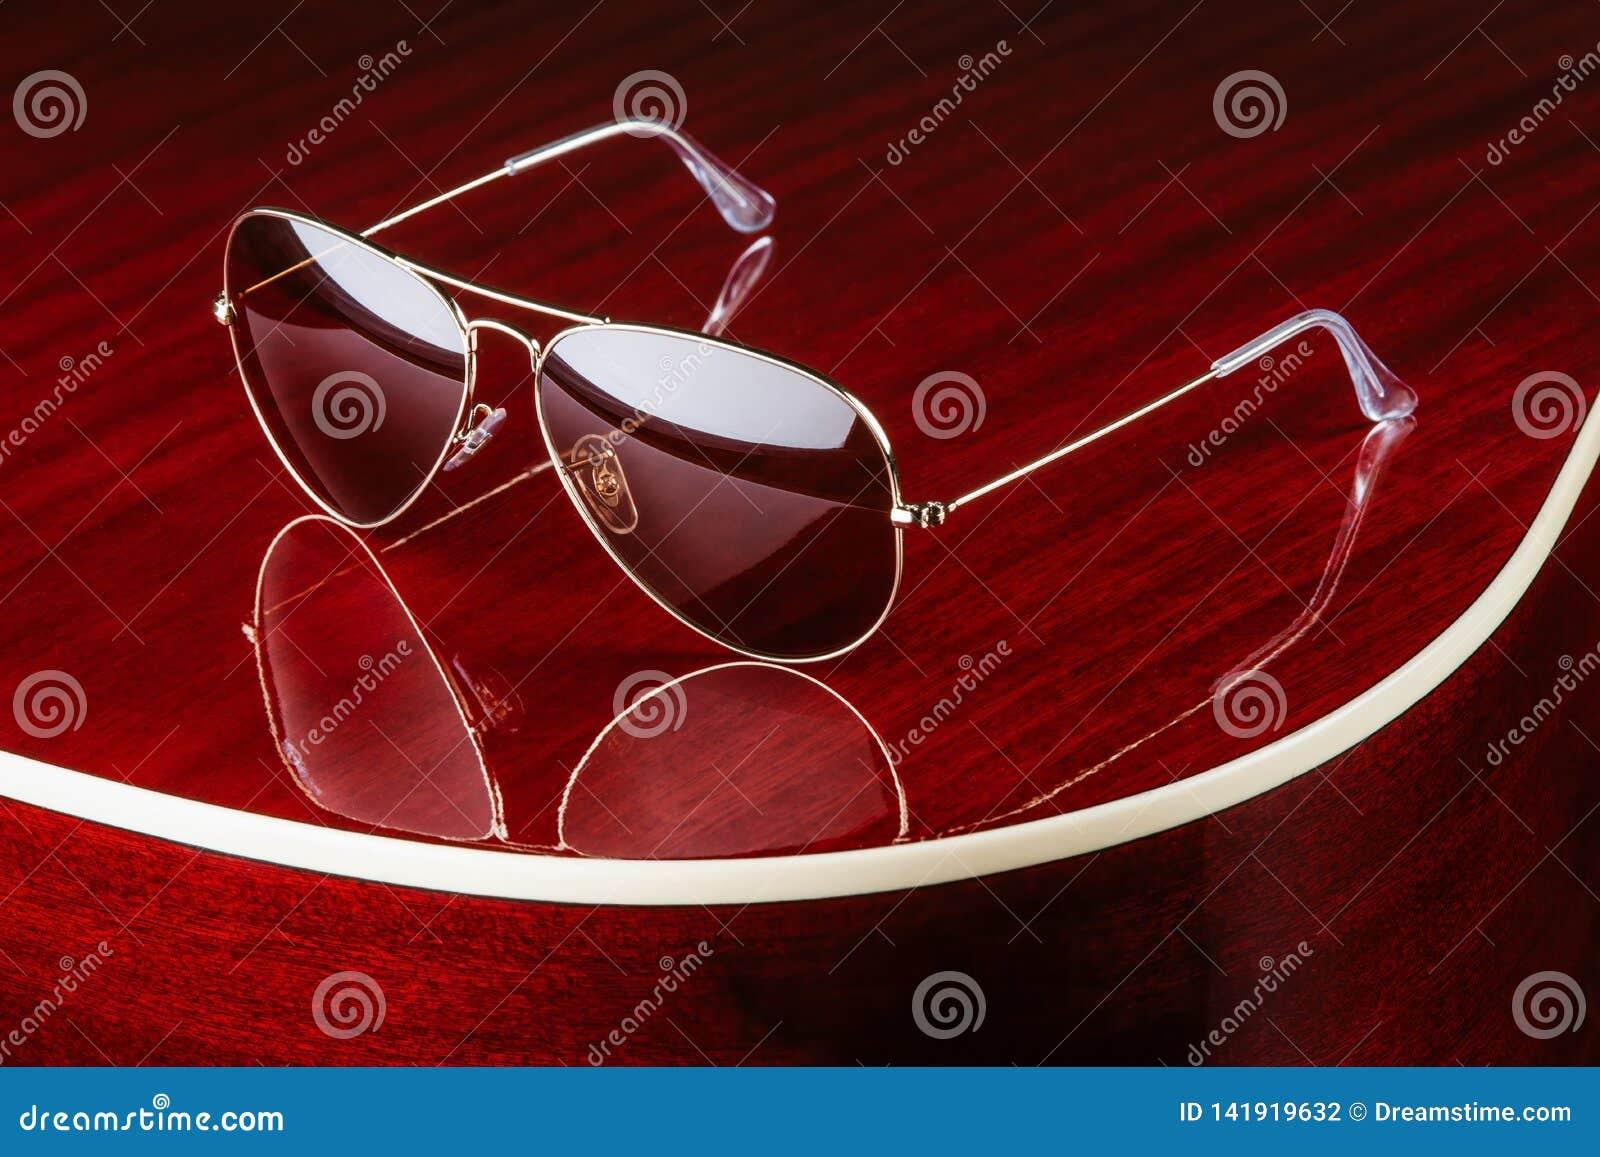 Aviator style sunglasses on glossy guitar